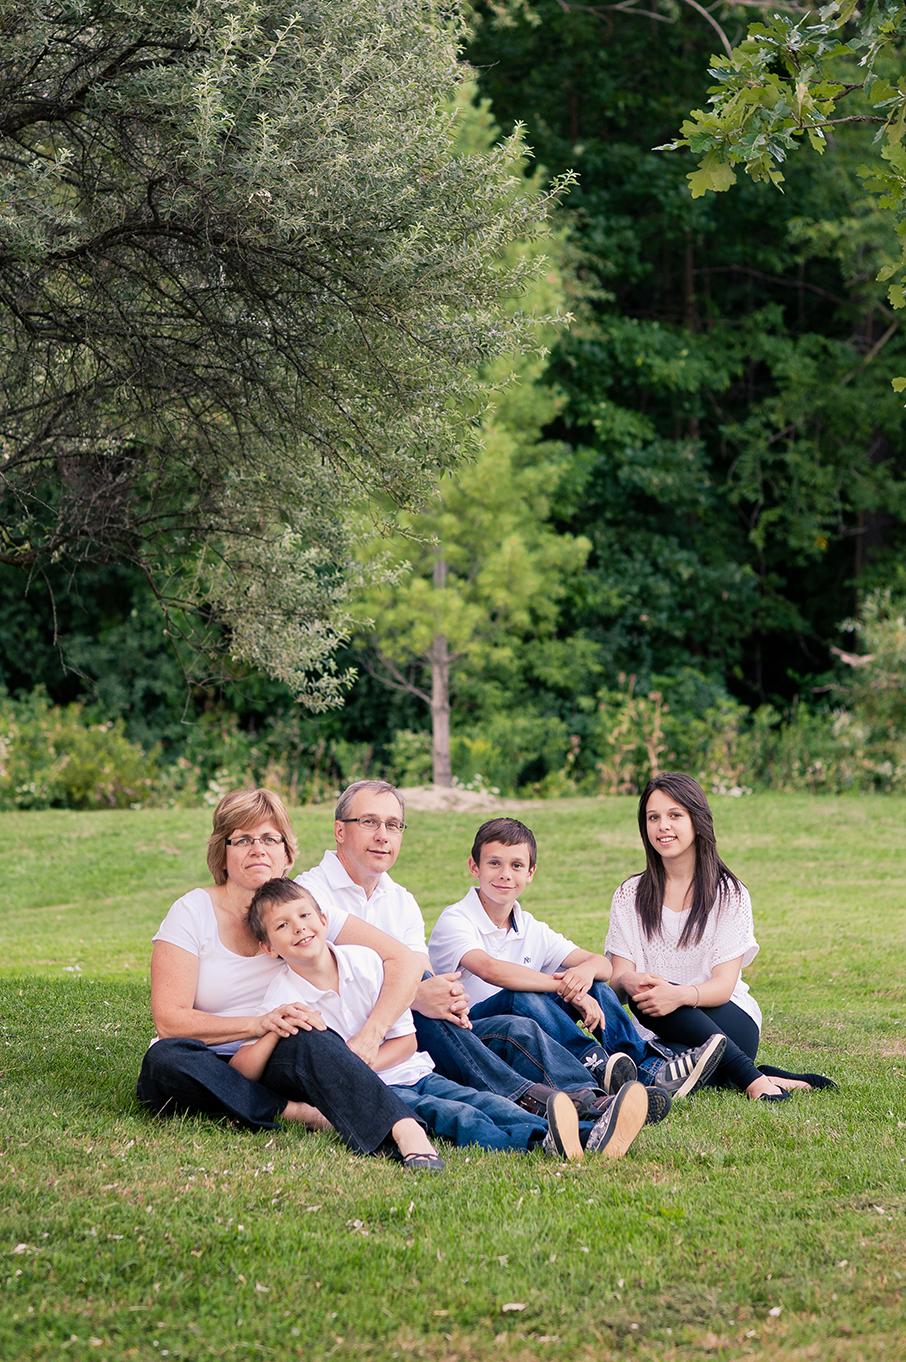 Mihevc_Family2012-17.jpg